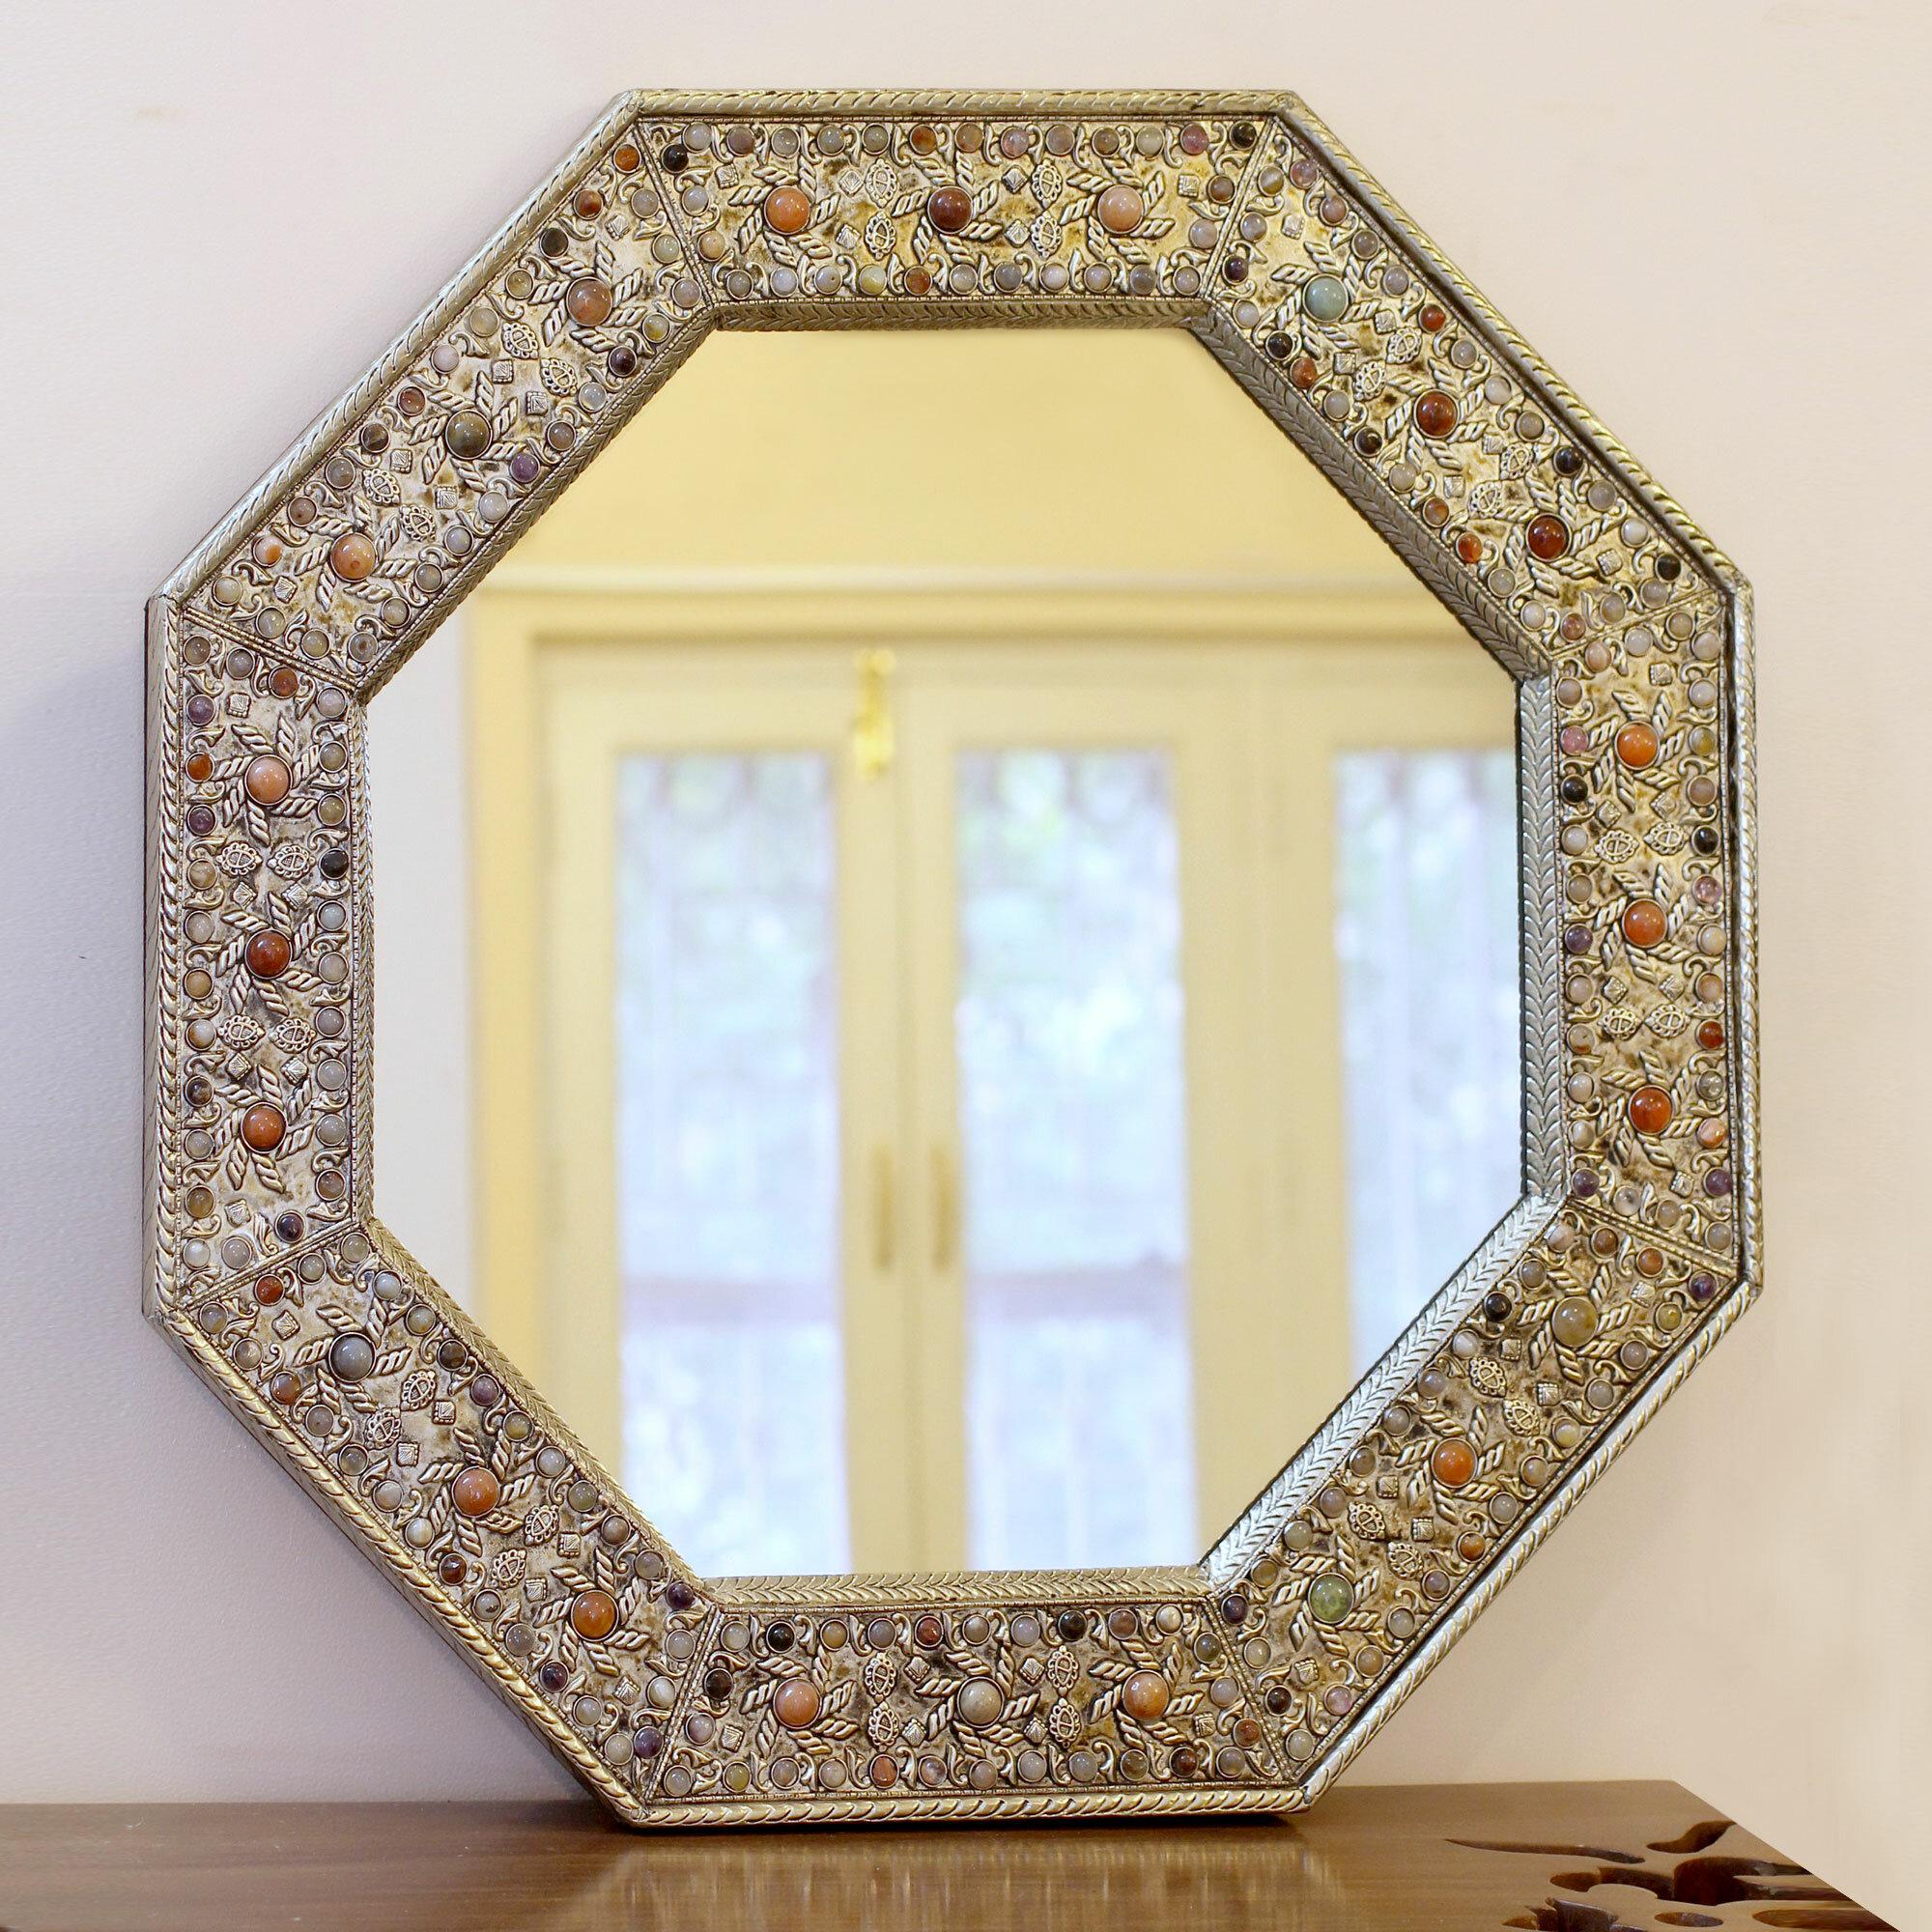 Novica Elegance Nickel On Brass Glass Inlay Wall Mirror | Wayfair